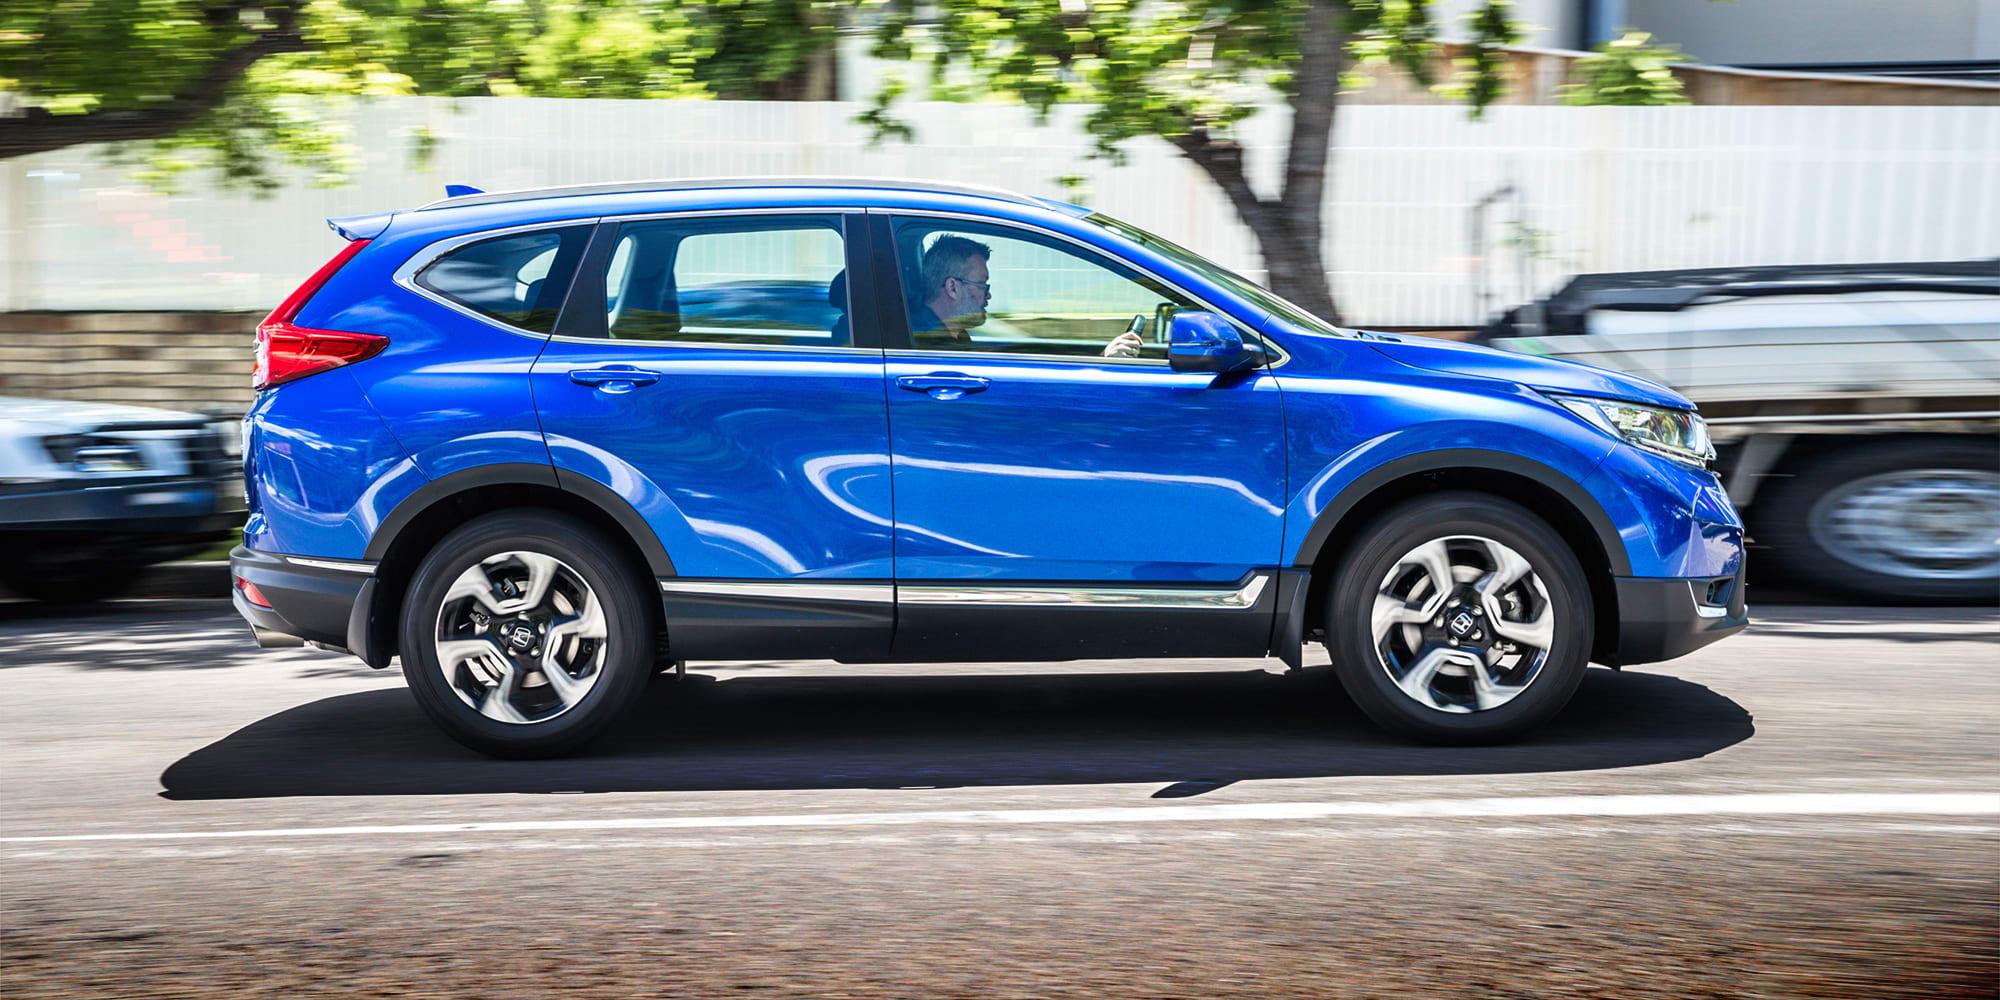 2019 Honda CR-V VTi-S AWD long-term review: Highway and